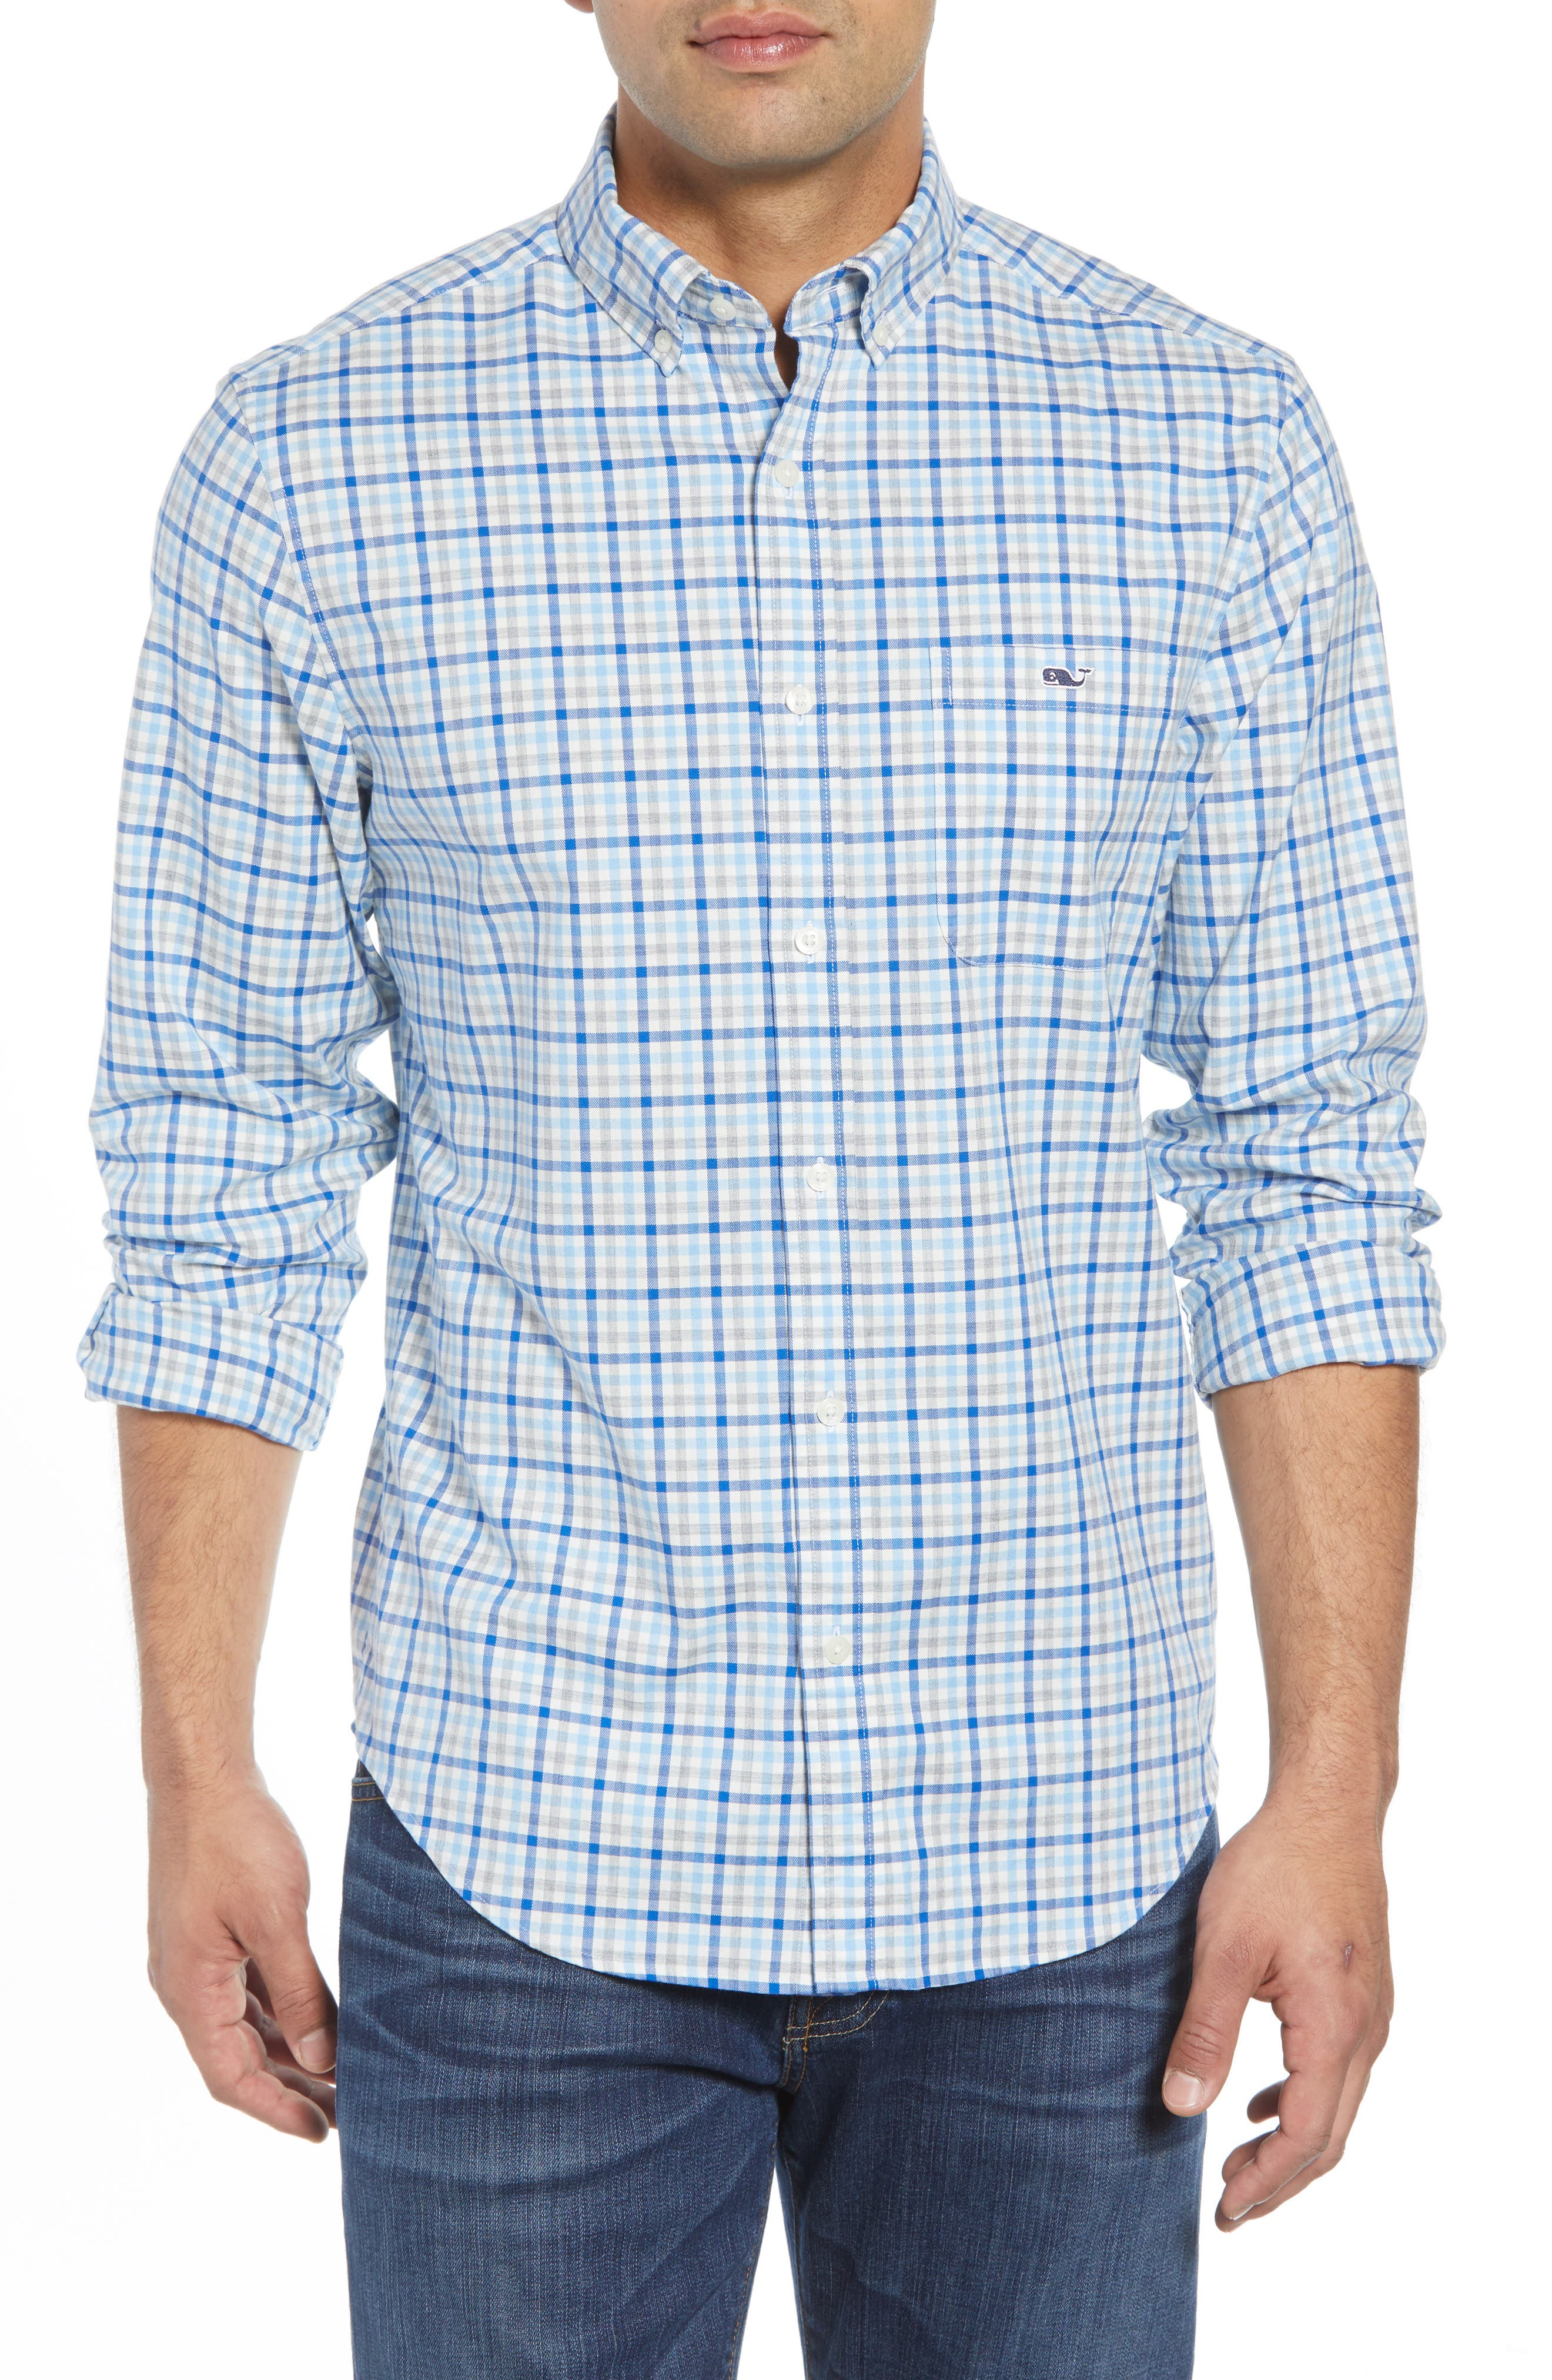 Pondview Regular Fit Check Sport Shirt,                             Main thumbnail 1, color,                             484